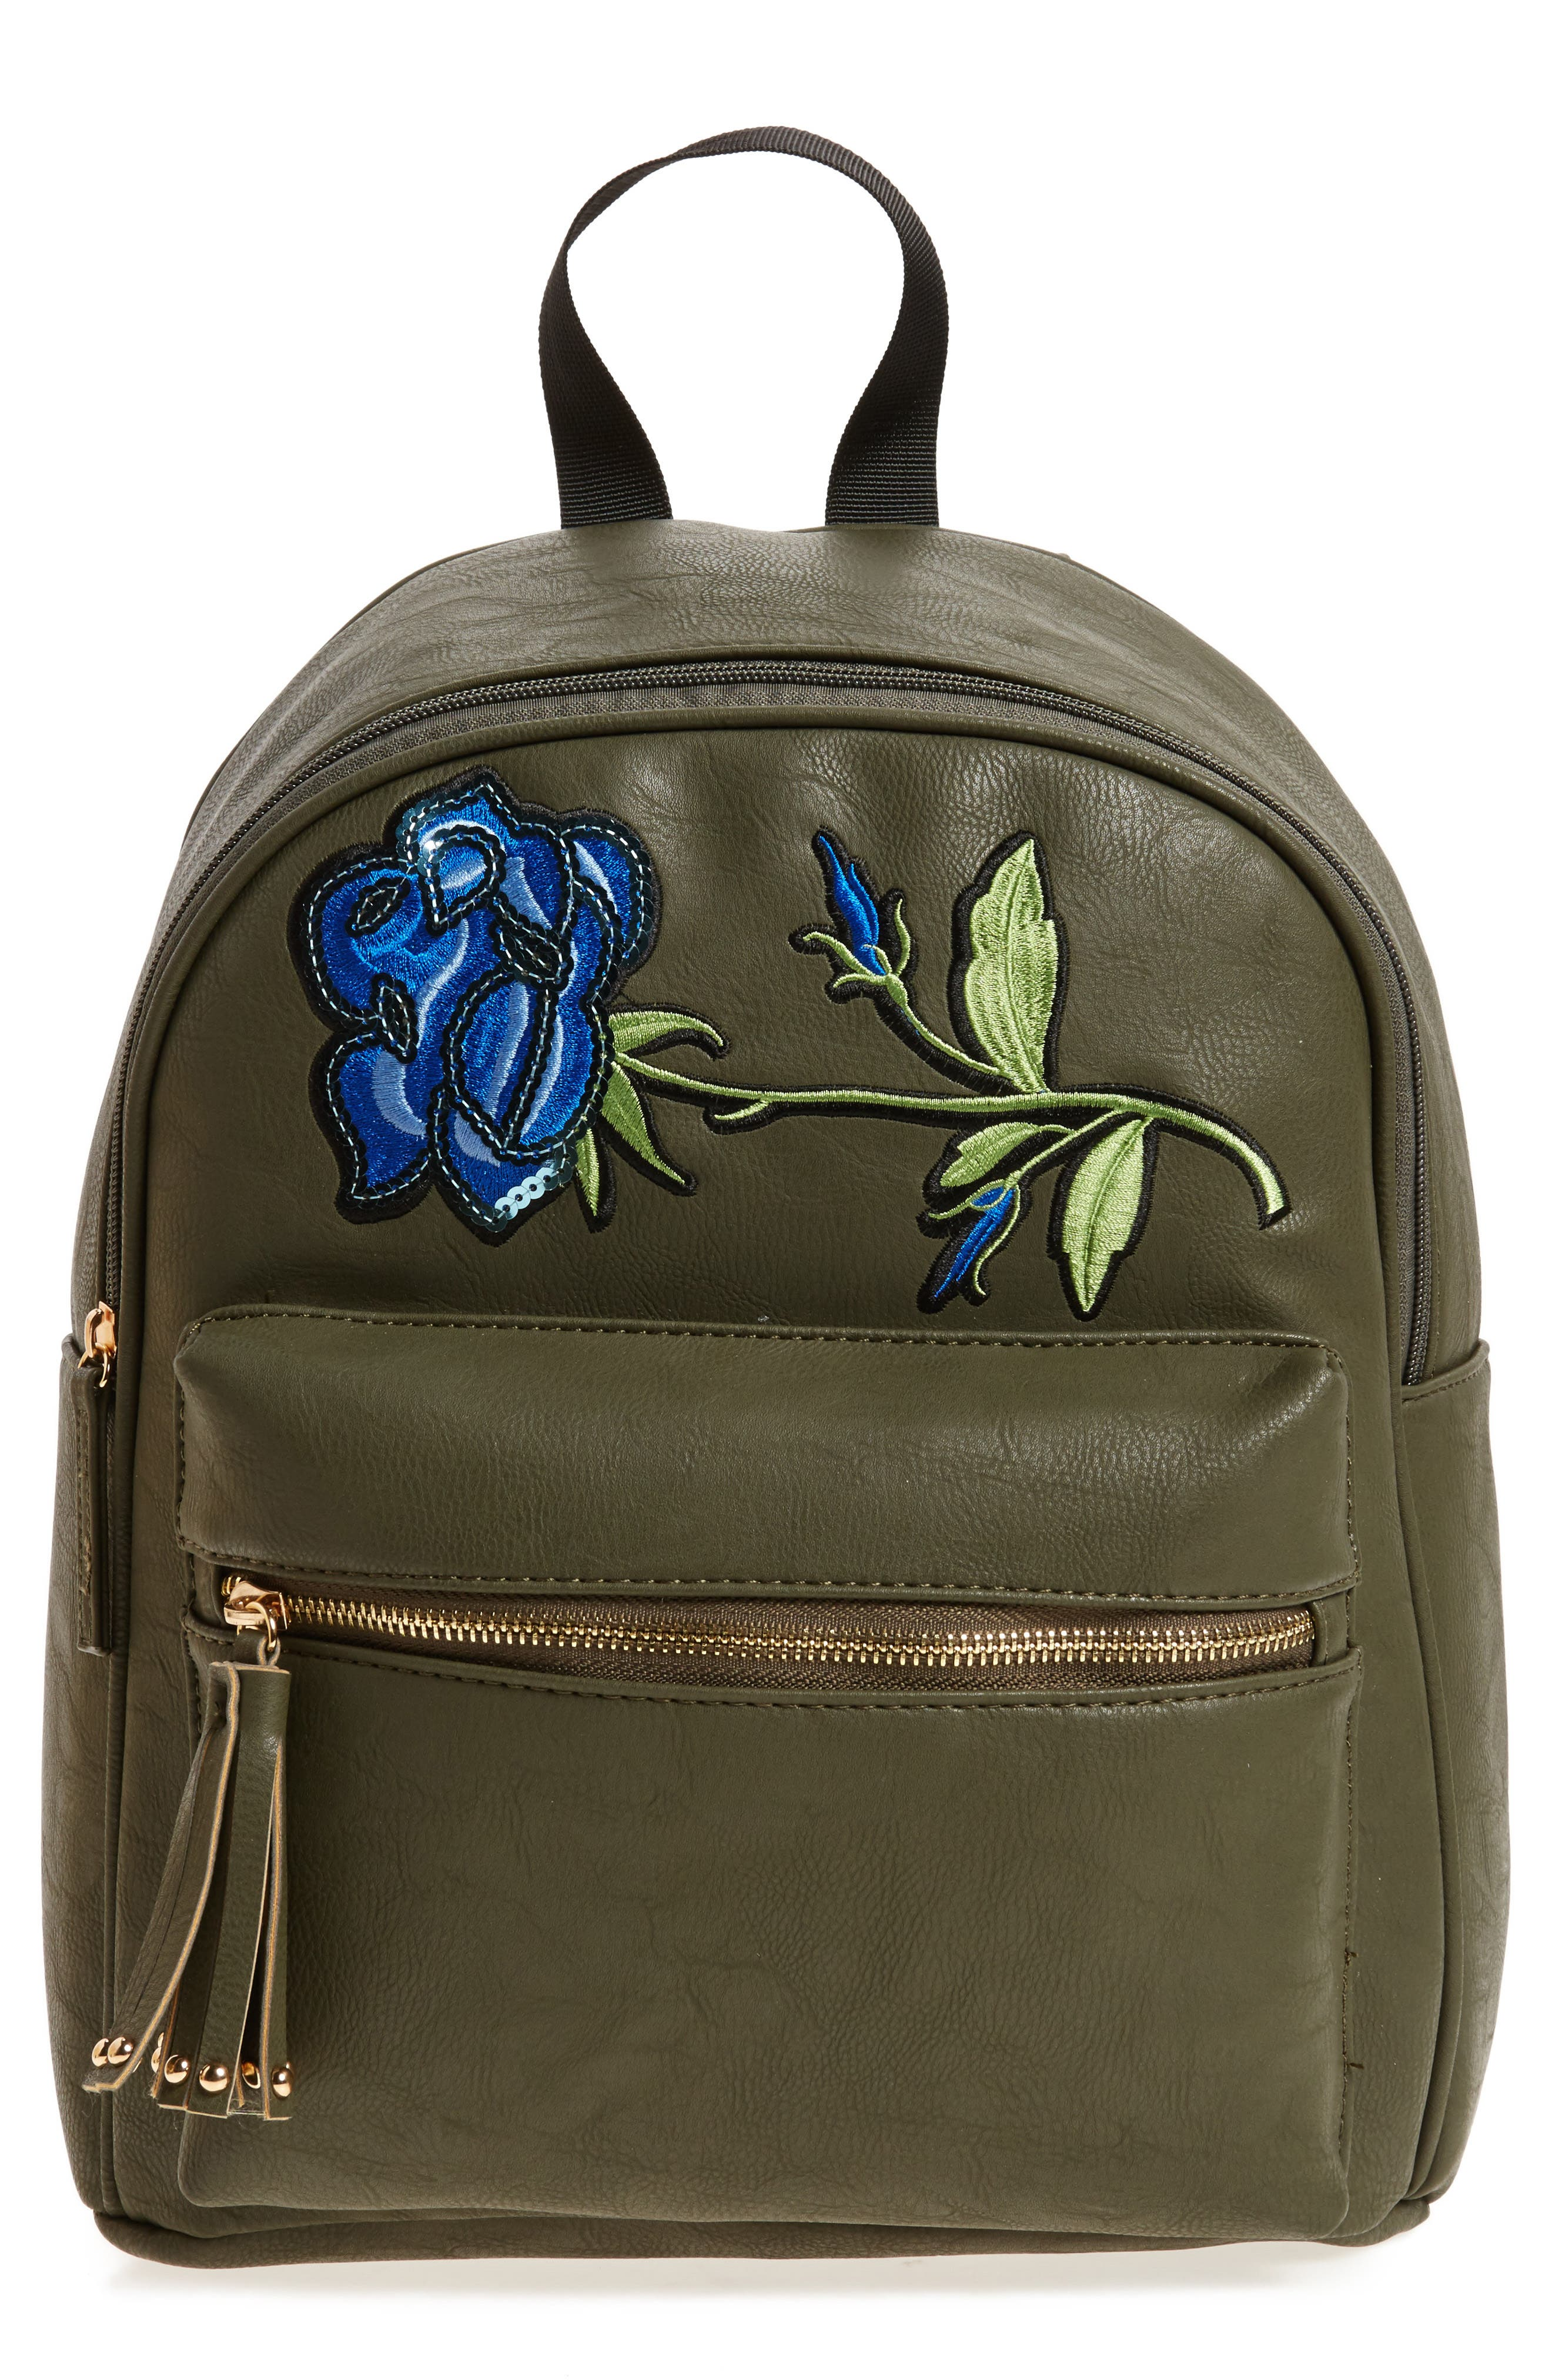 Sequin Rose Appliqué Faux Leather Backpack,                             Main thumbnail 1, color,                             Olive